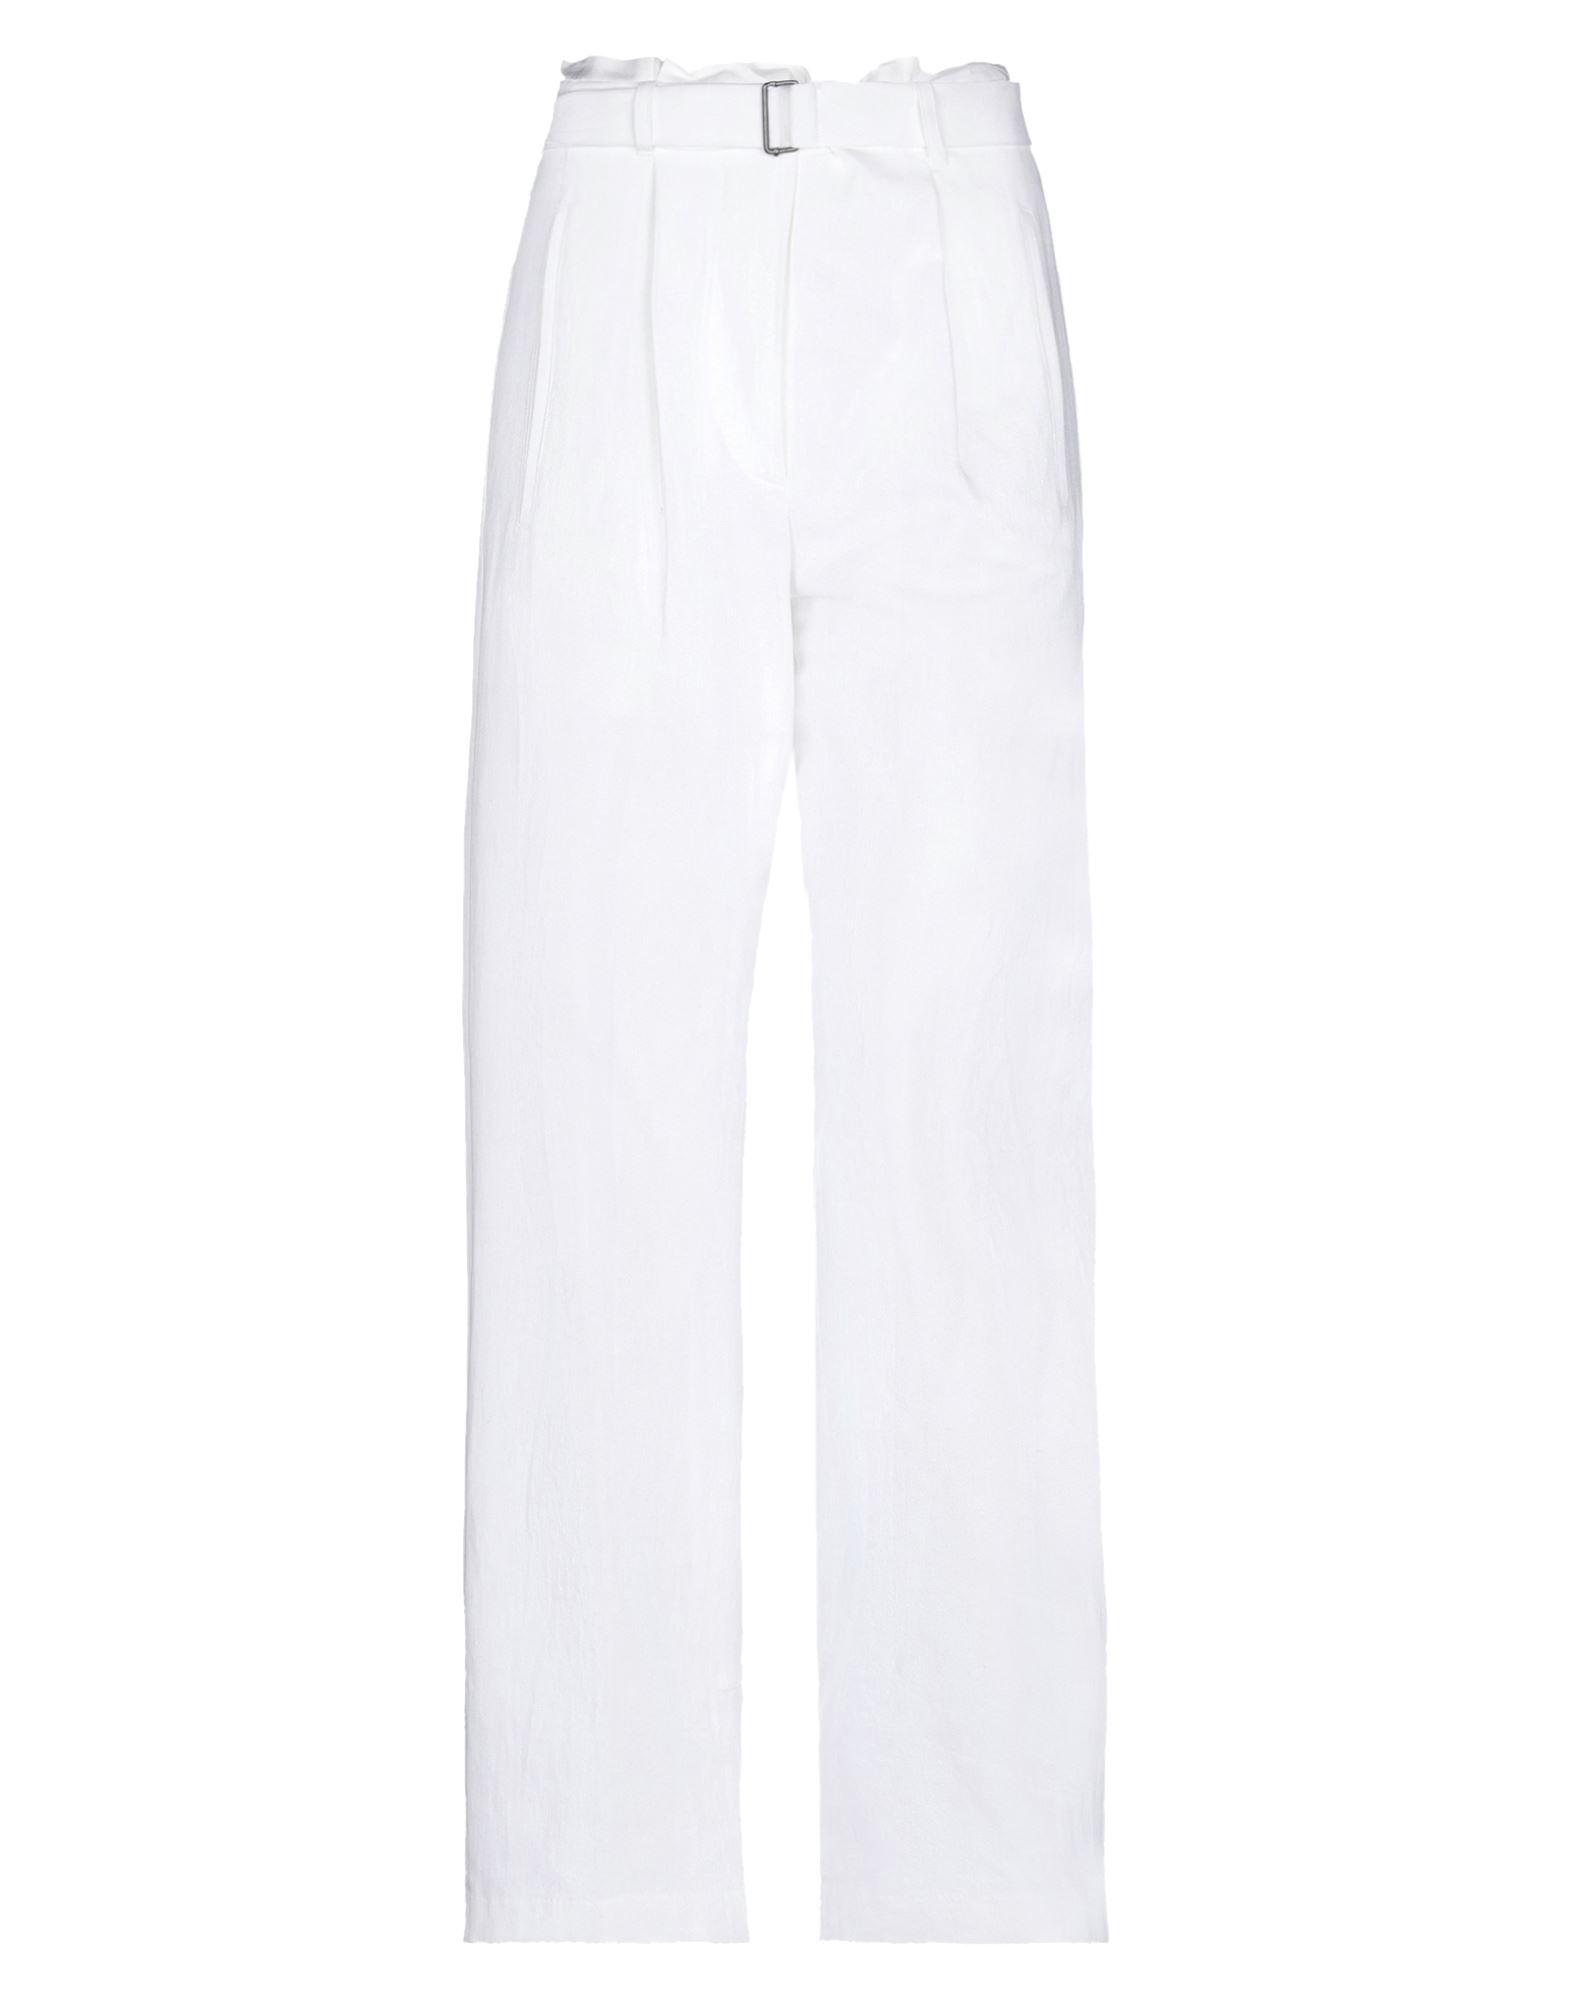 ANN DEMEULEMEESTER Denim pants - Item 42822137